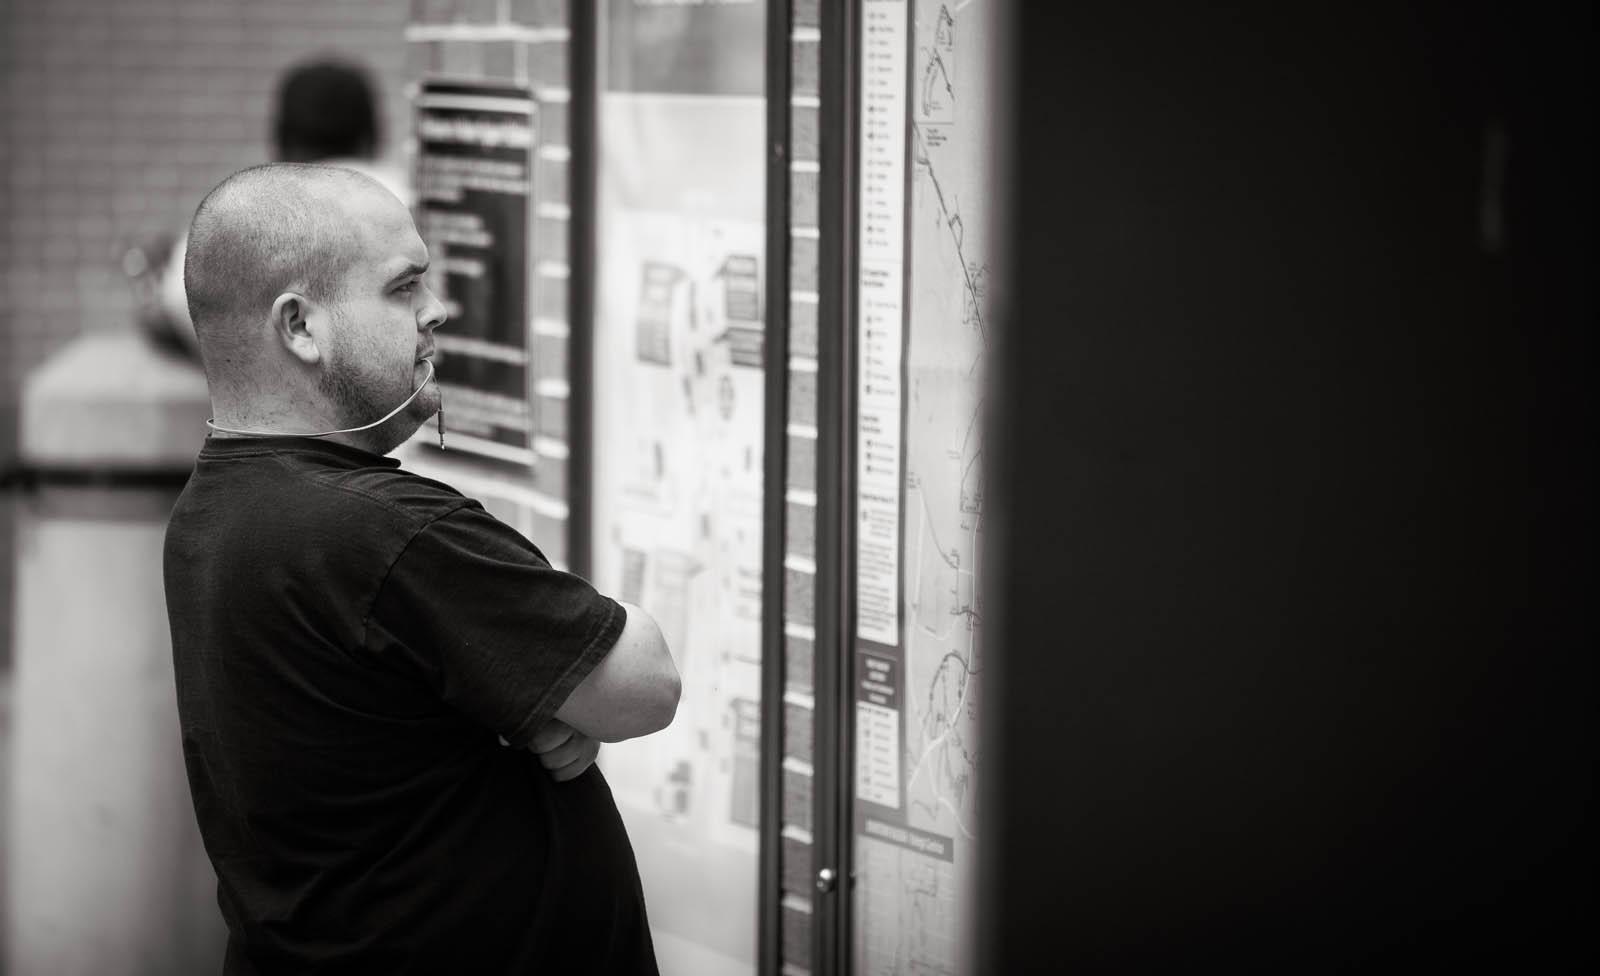 StreetPhotography_DownTownRaleighNC_ErnestoSue-2378.jpg